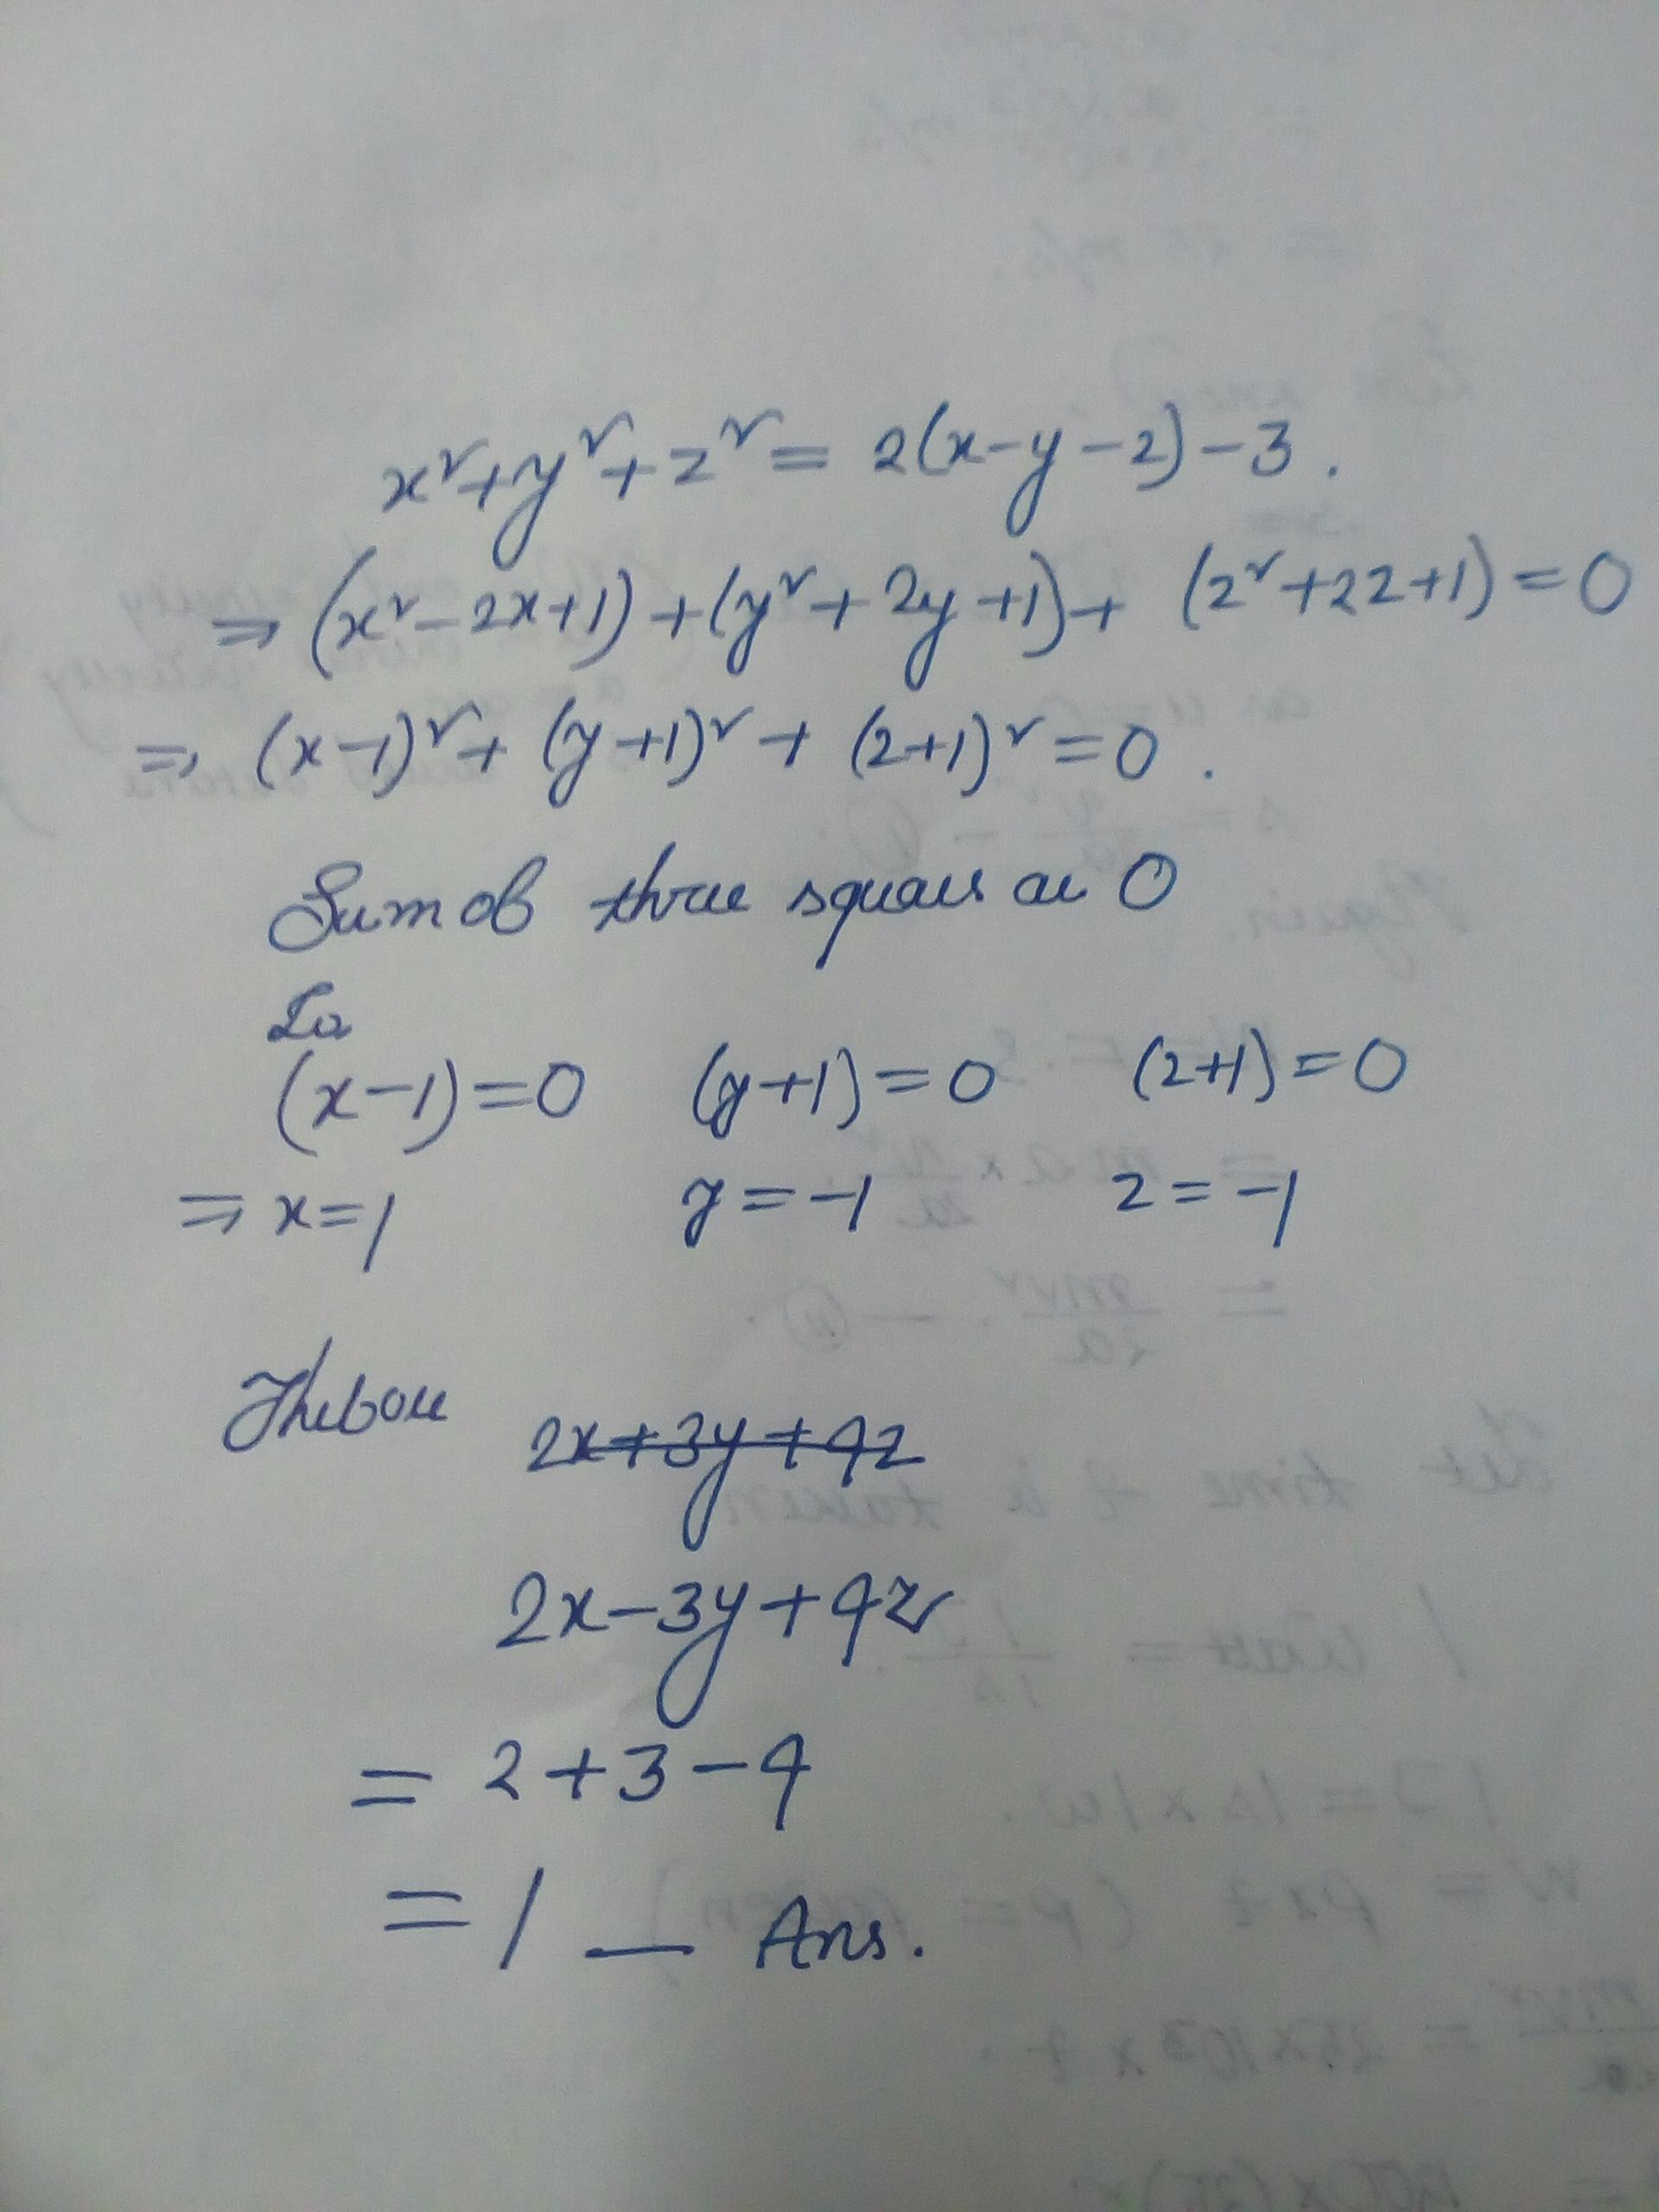 If X2y2 Z2 2 X Y Z 3 What Is The Value Of 2x 3y4z